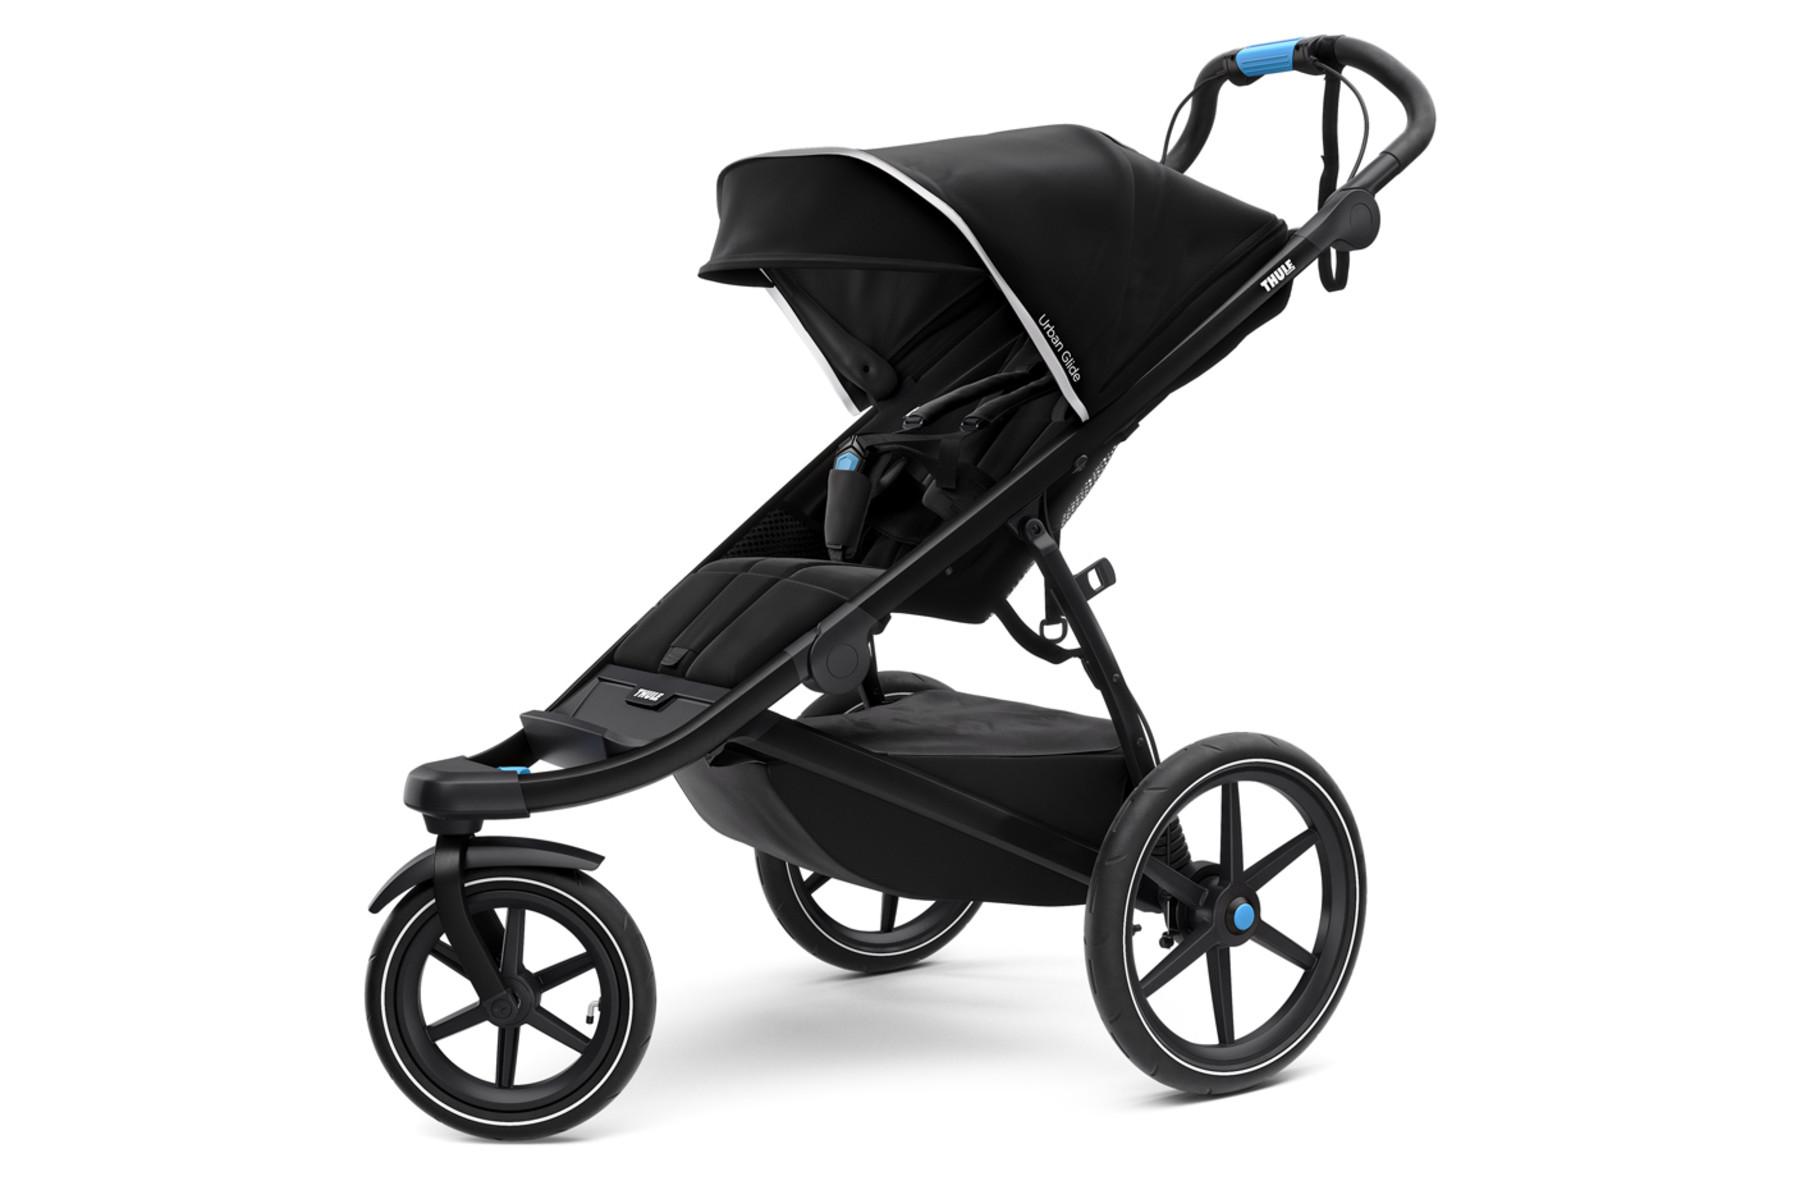 carrinho-bebe-3-rodas-thule-corrida